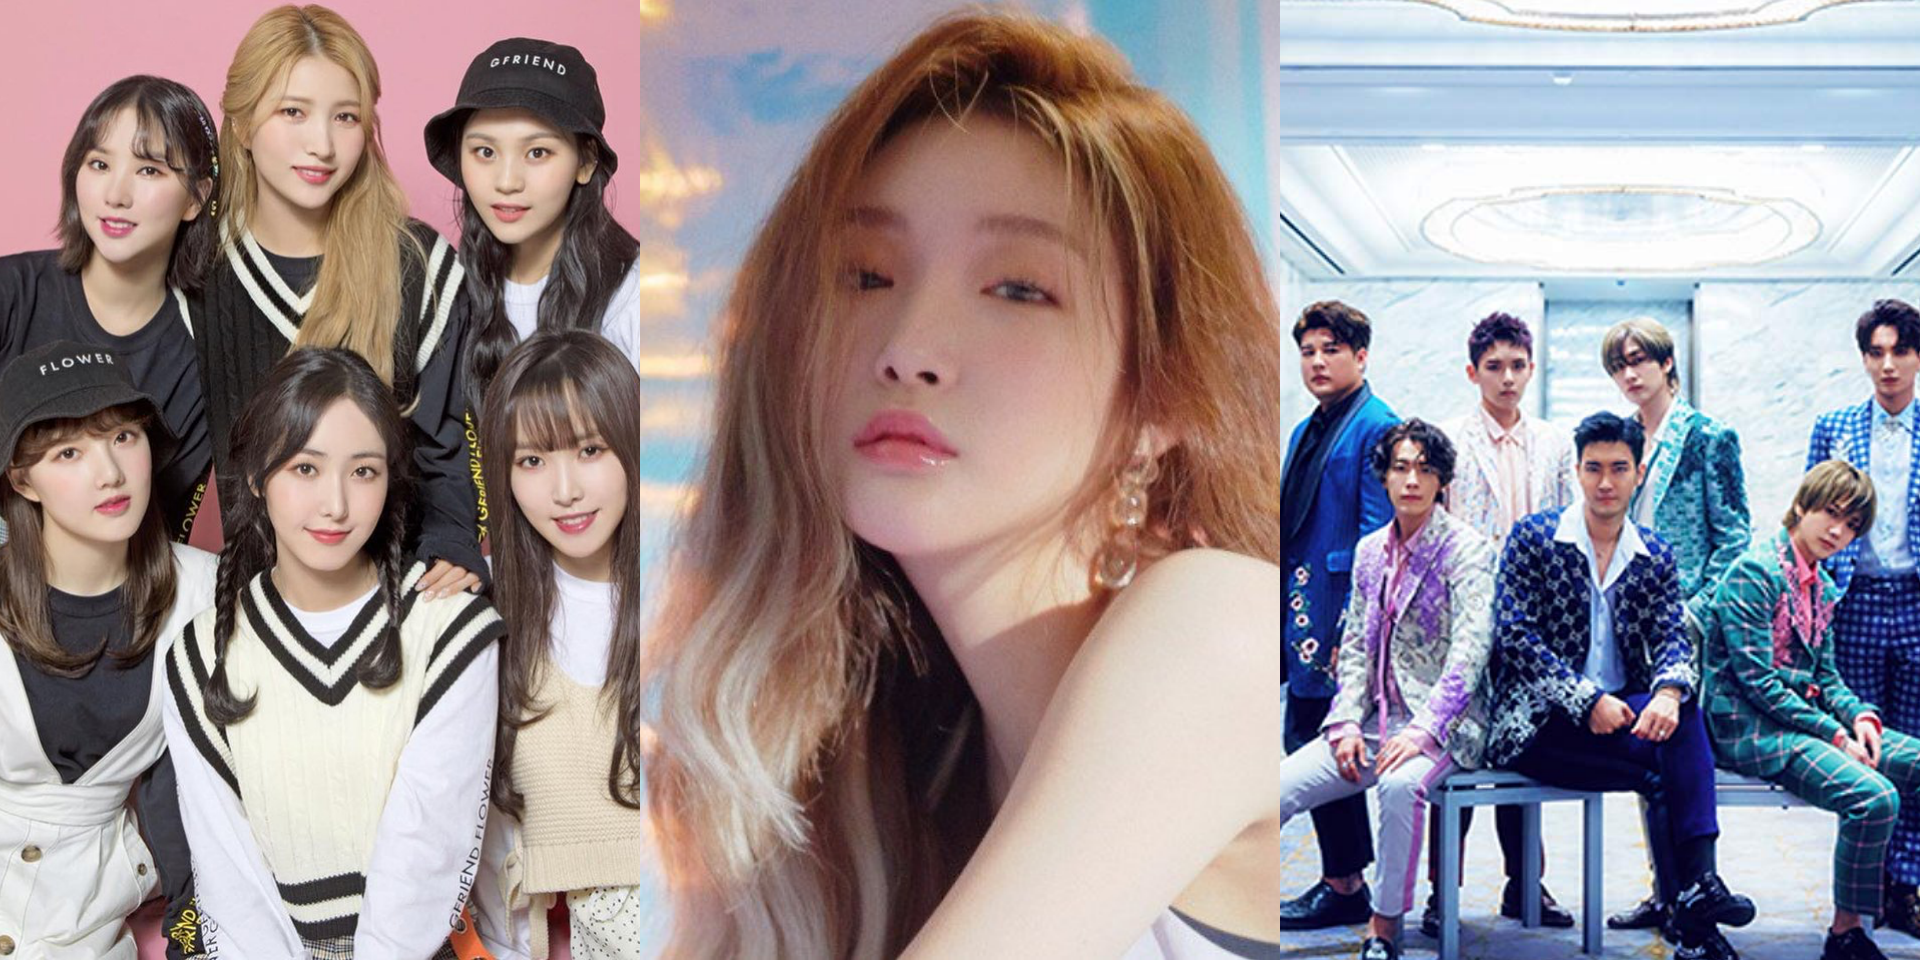 KAMP festival brings Super Junior, Chung Ha, GFriend and more to Singapore